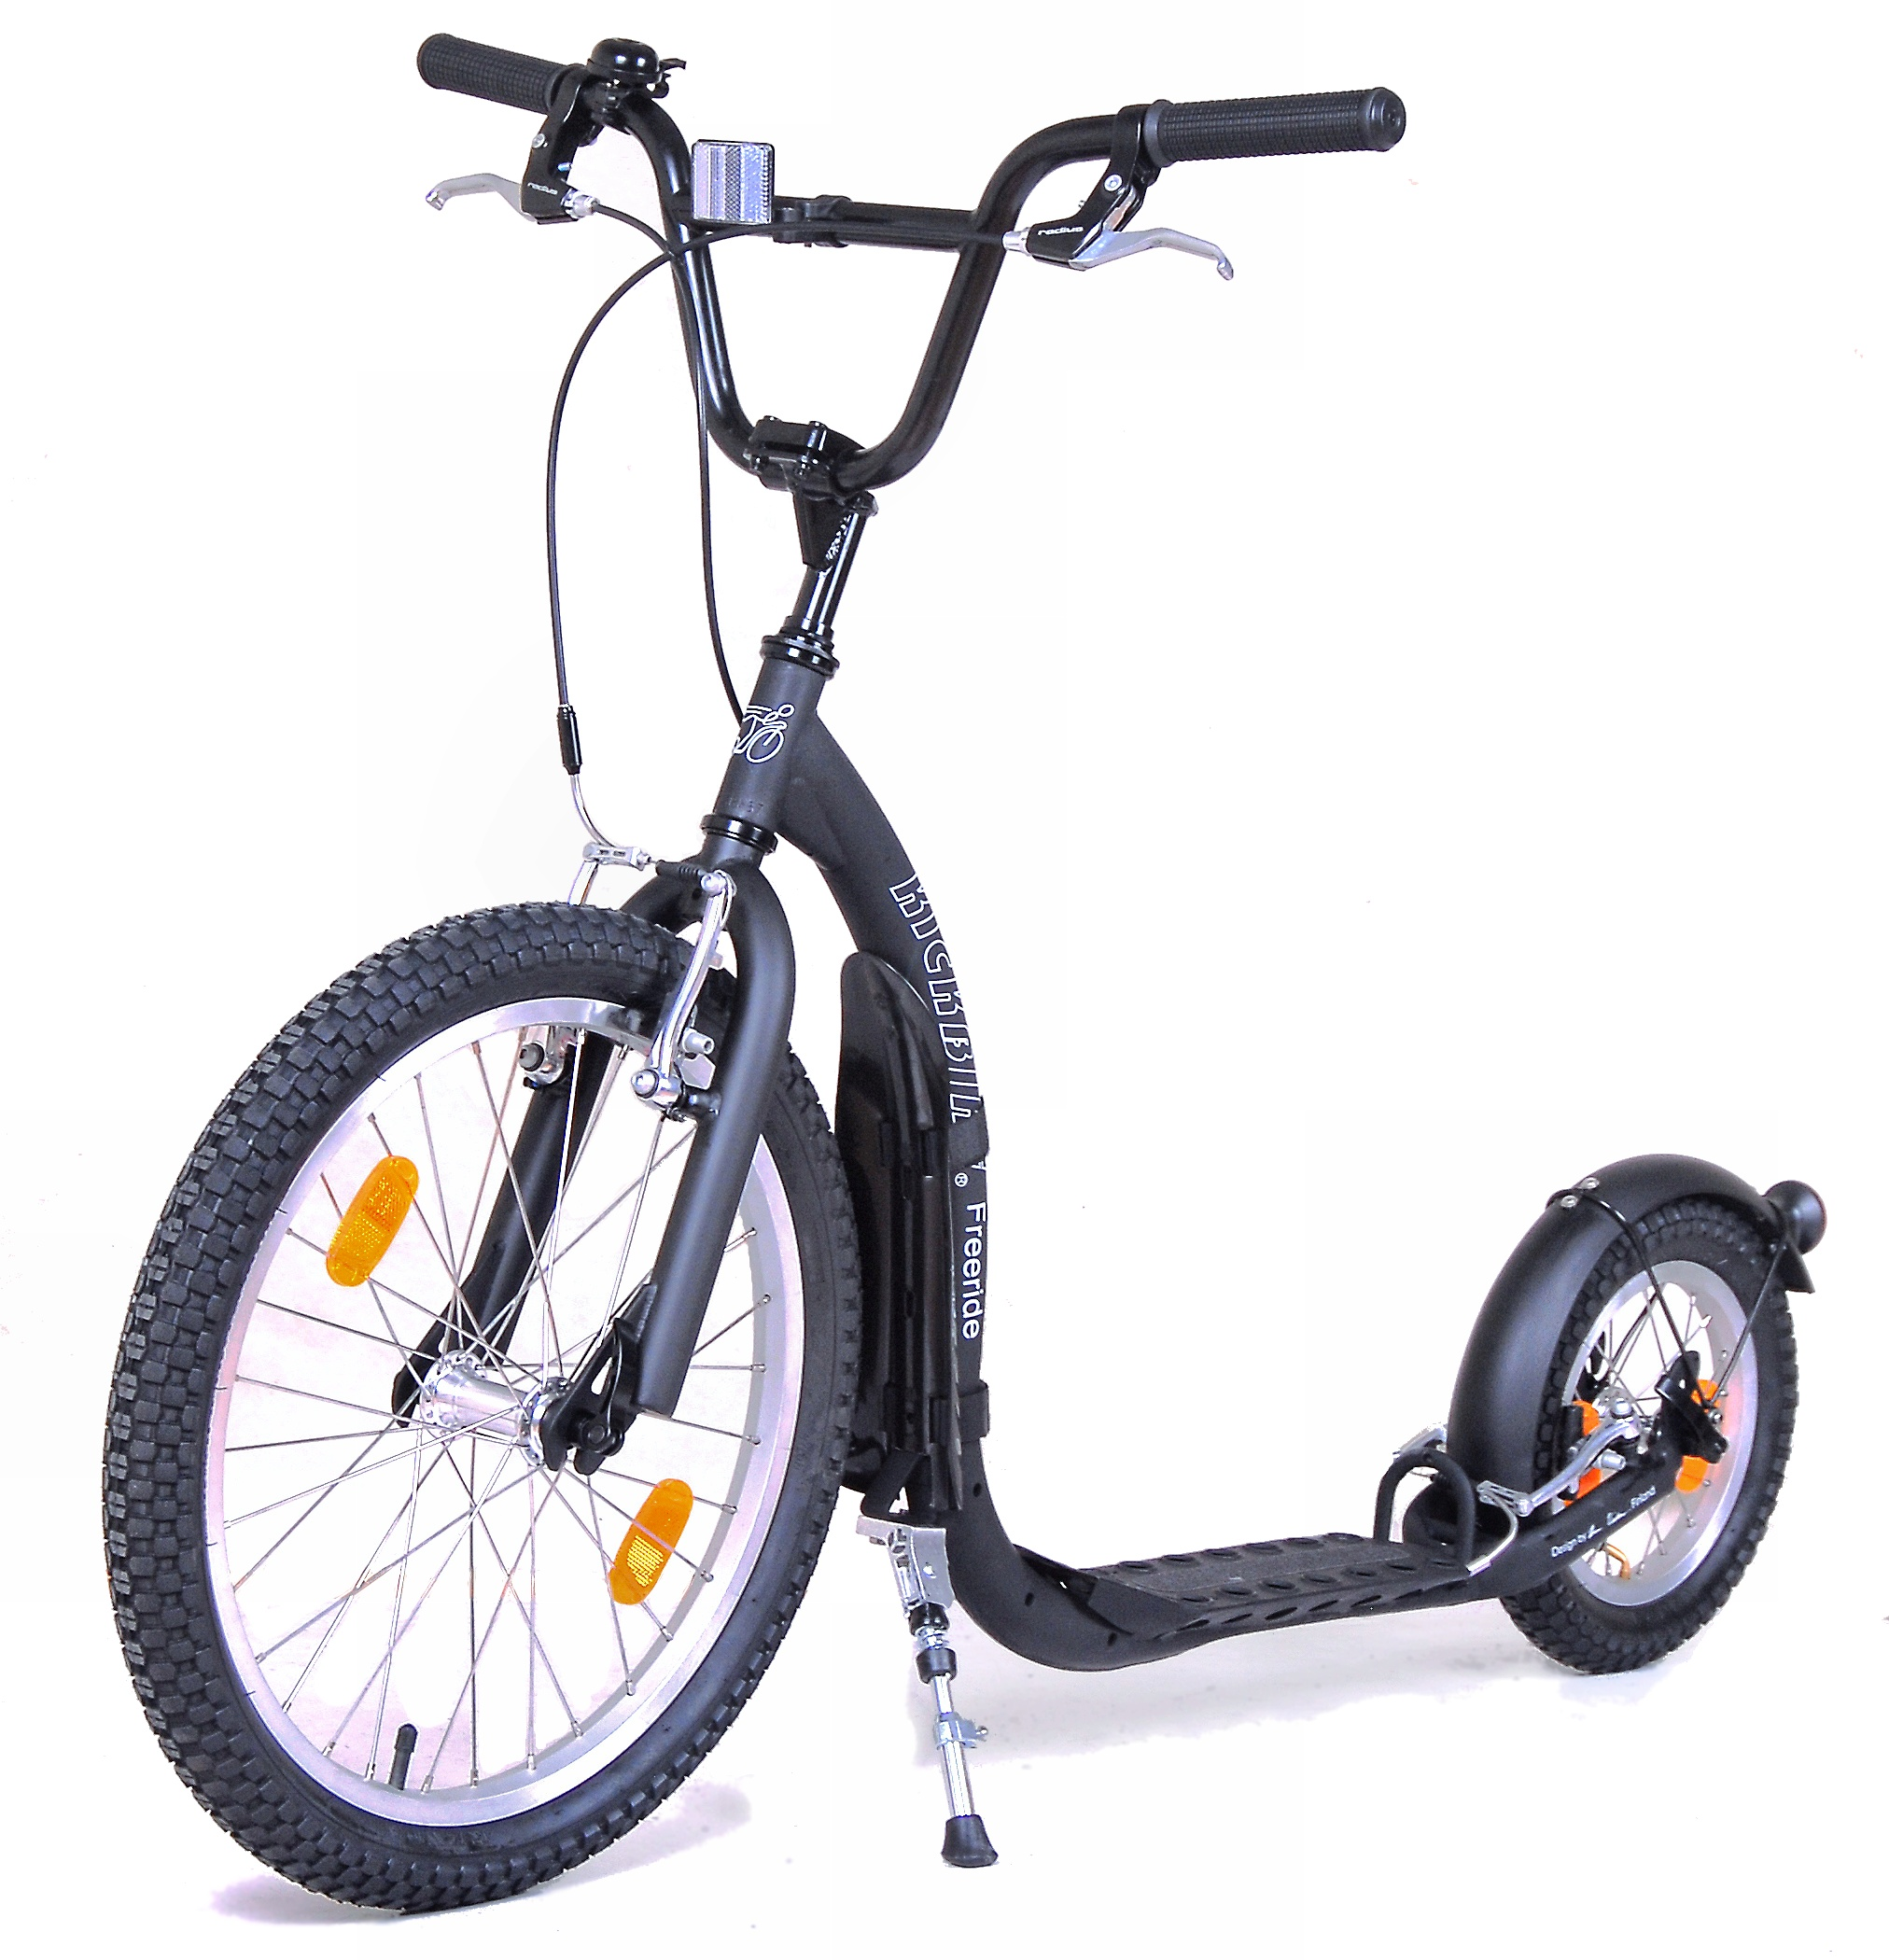 kickbike freeride trotinette grande roue pour enfant. Black Bedroom Furniture Sets. Home Design Ideas